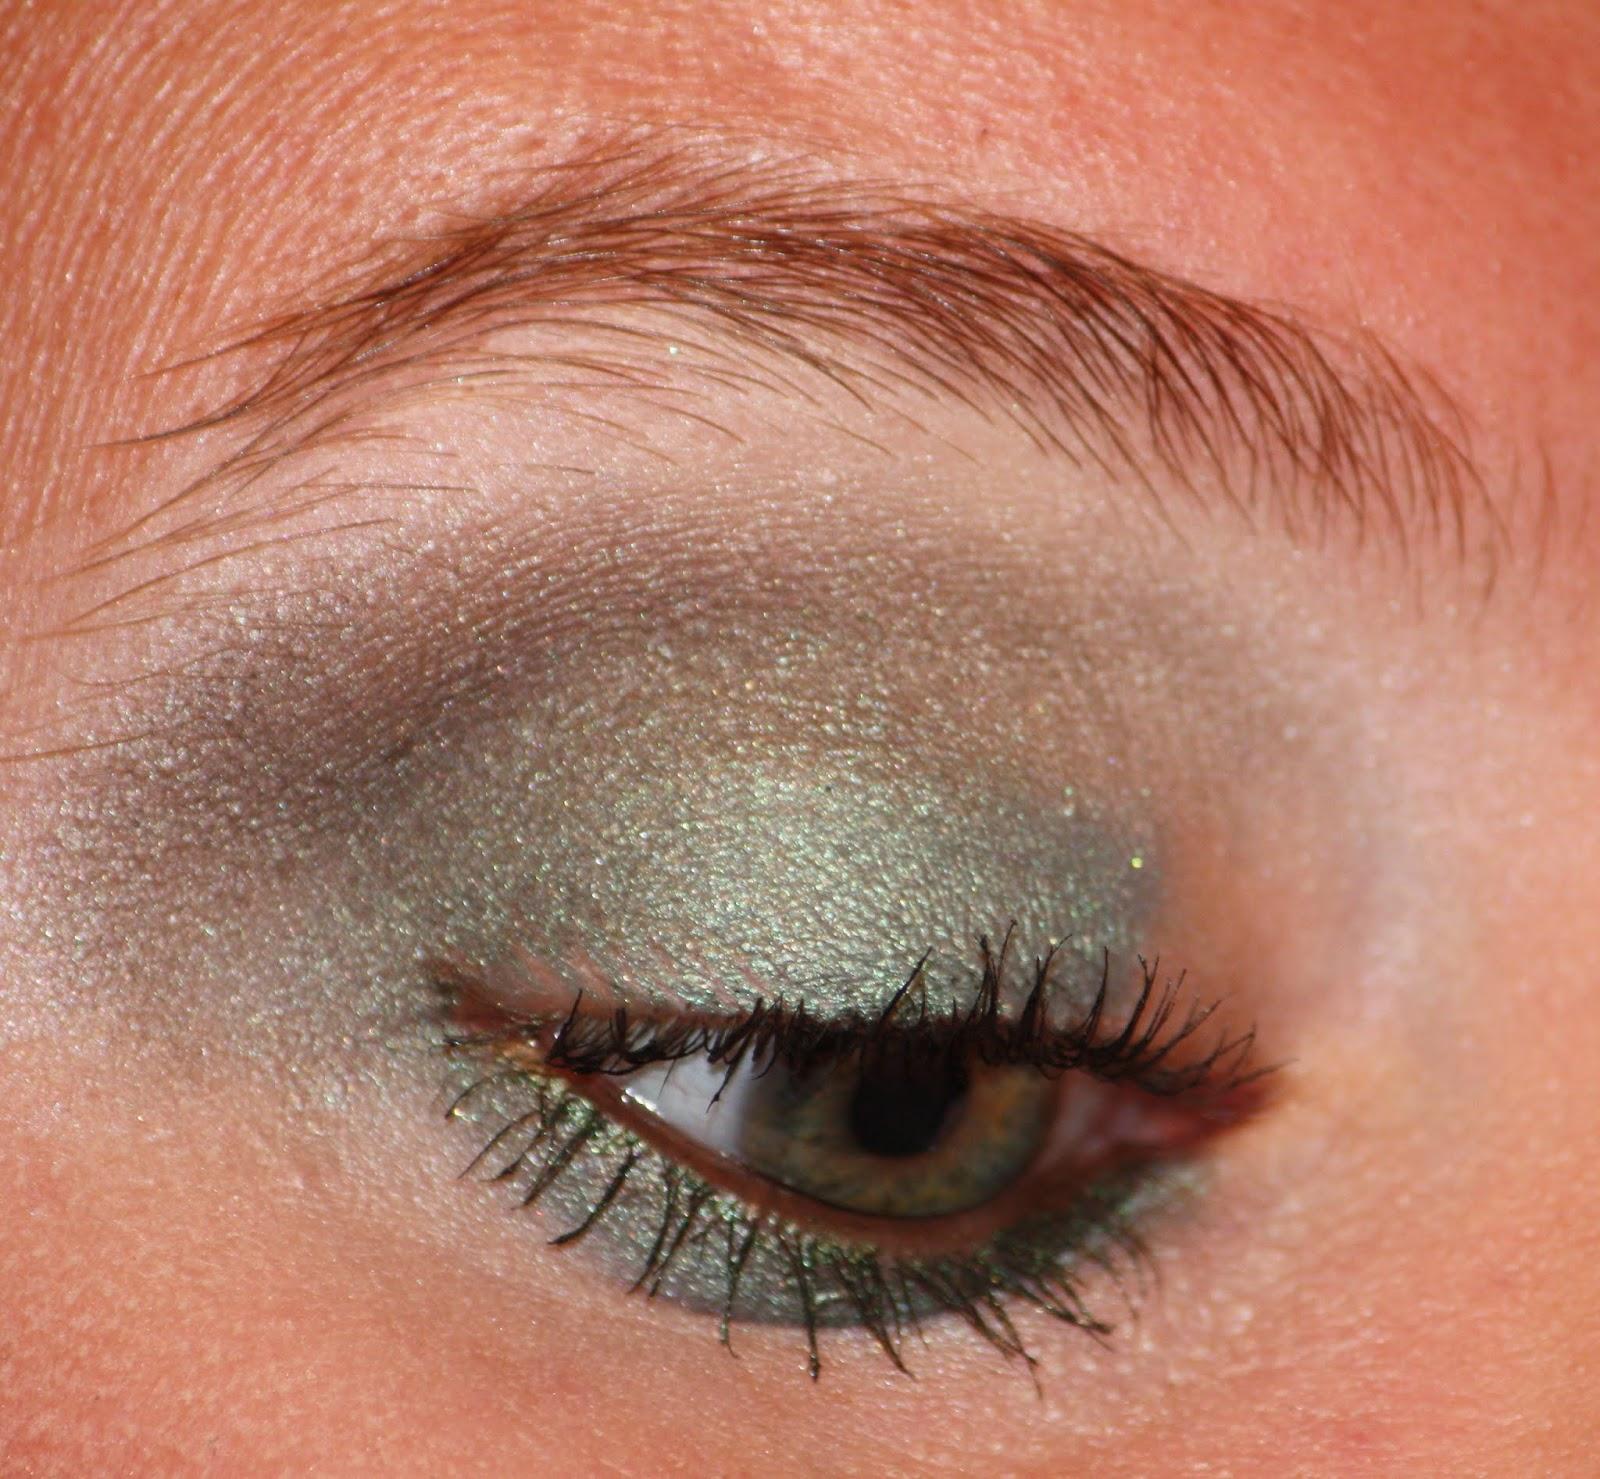 Die Zauberin Zebulon: Frosty Green Eye MakeUp